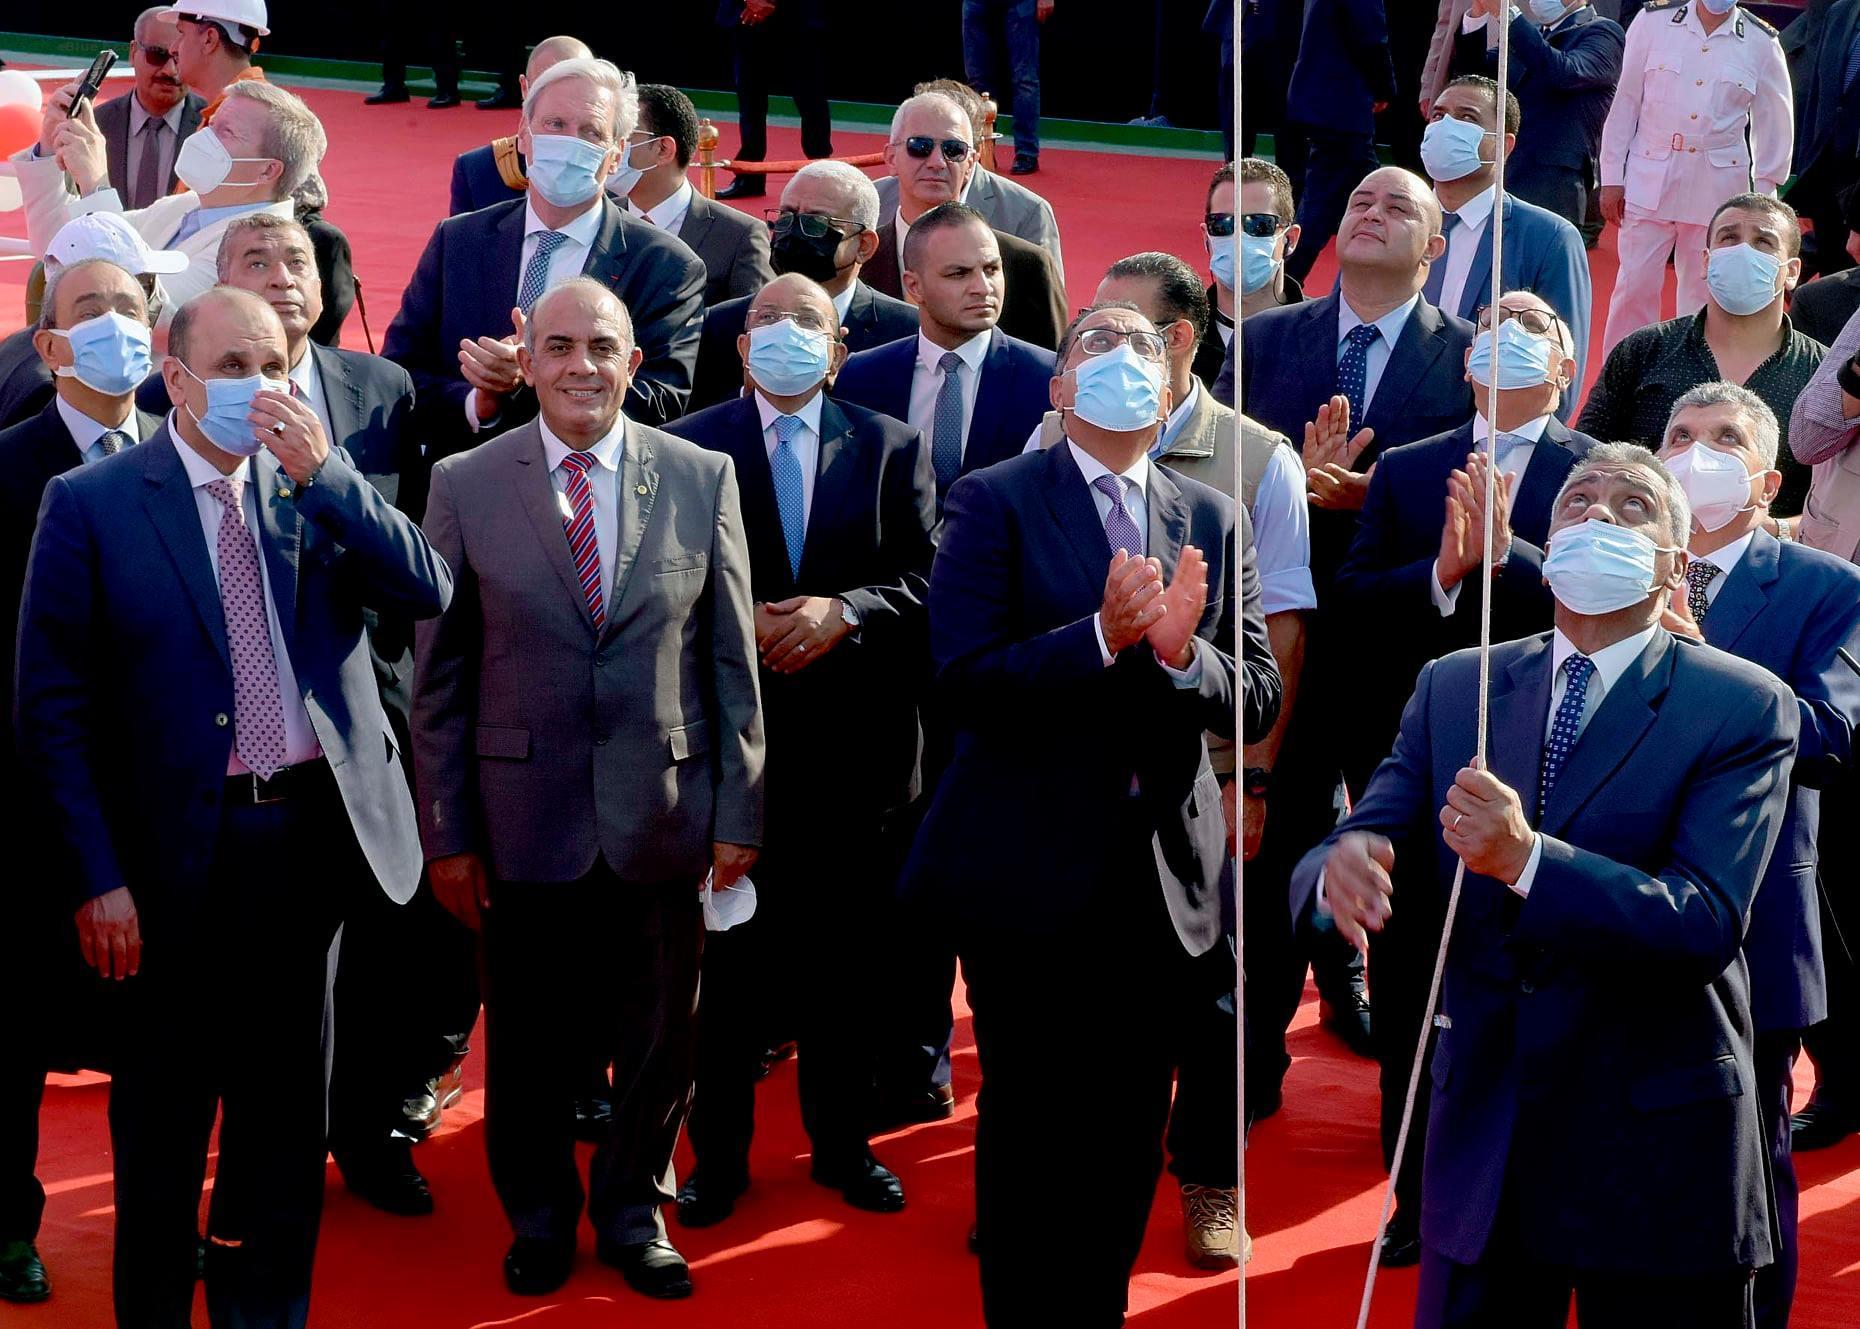 eBlue_economy_احتفالية رفع العلم على الكراكة حسين طنطاوى